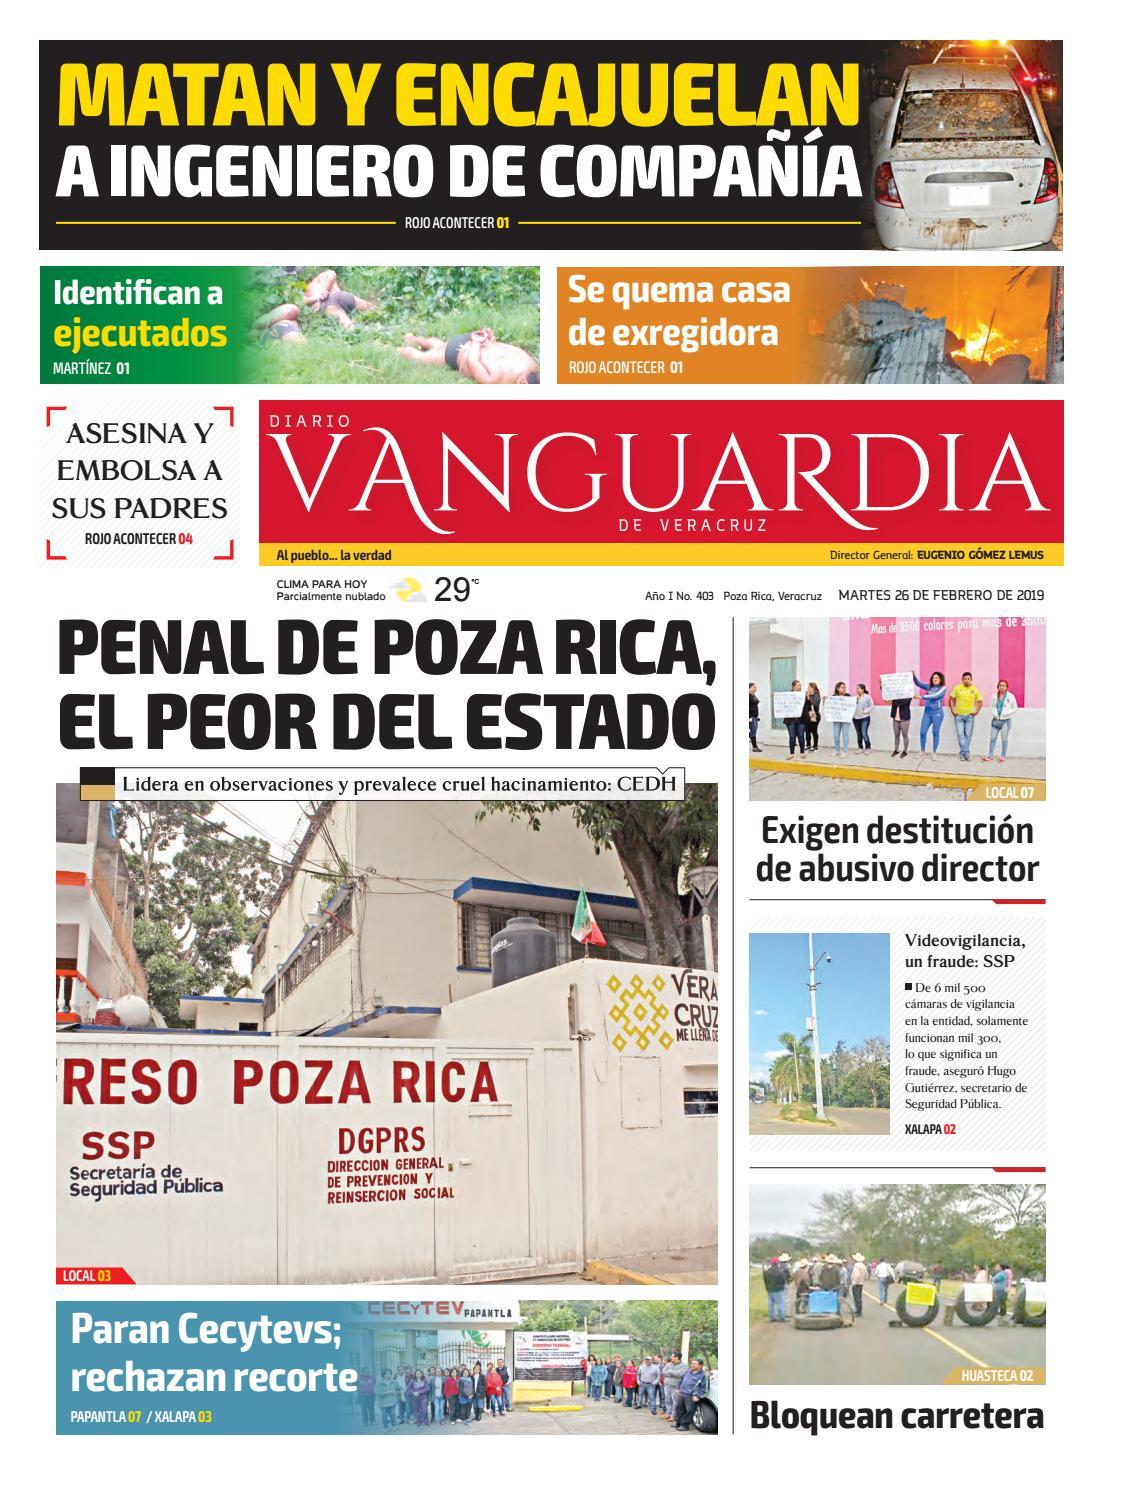 ad6982a0 Diario Vanguardia Veracruz 26 de febrero 2019 by Vanguardia Veracruz - issuu